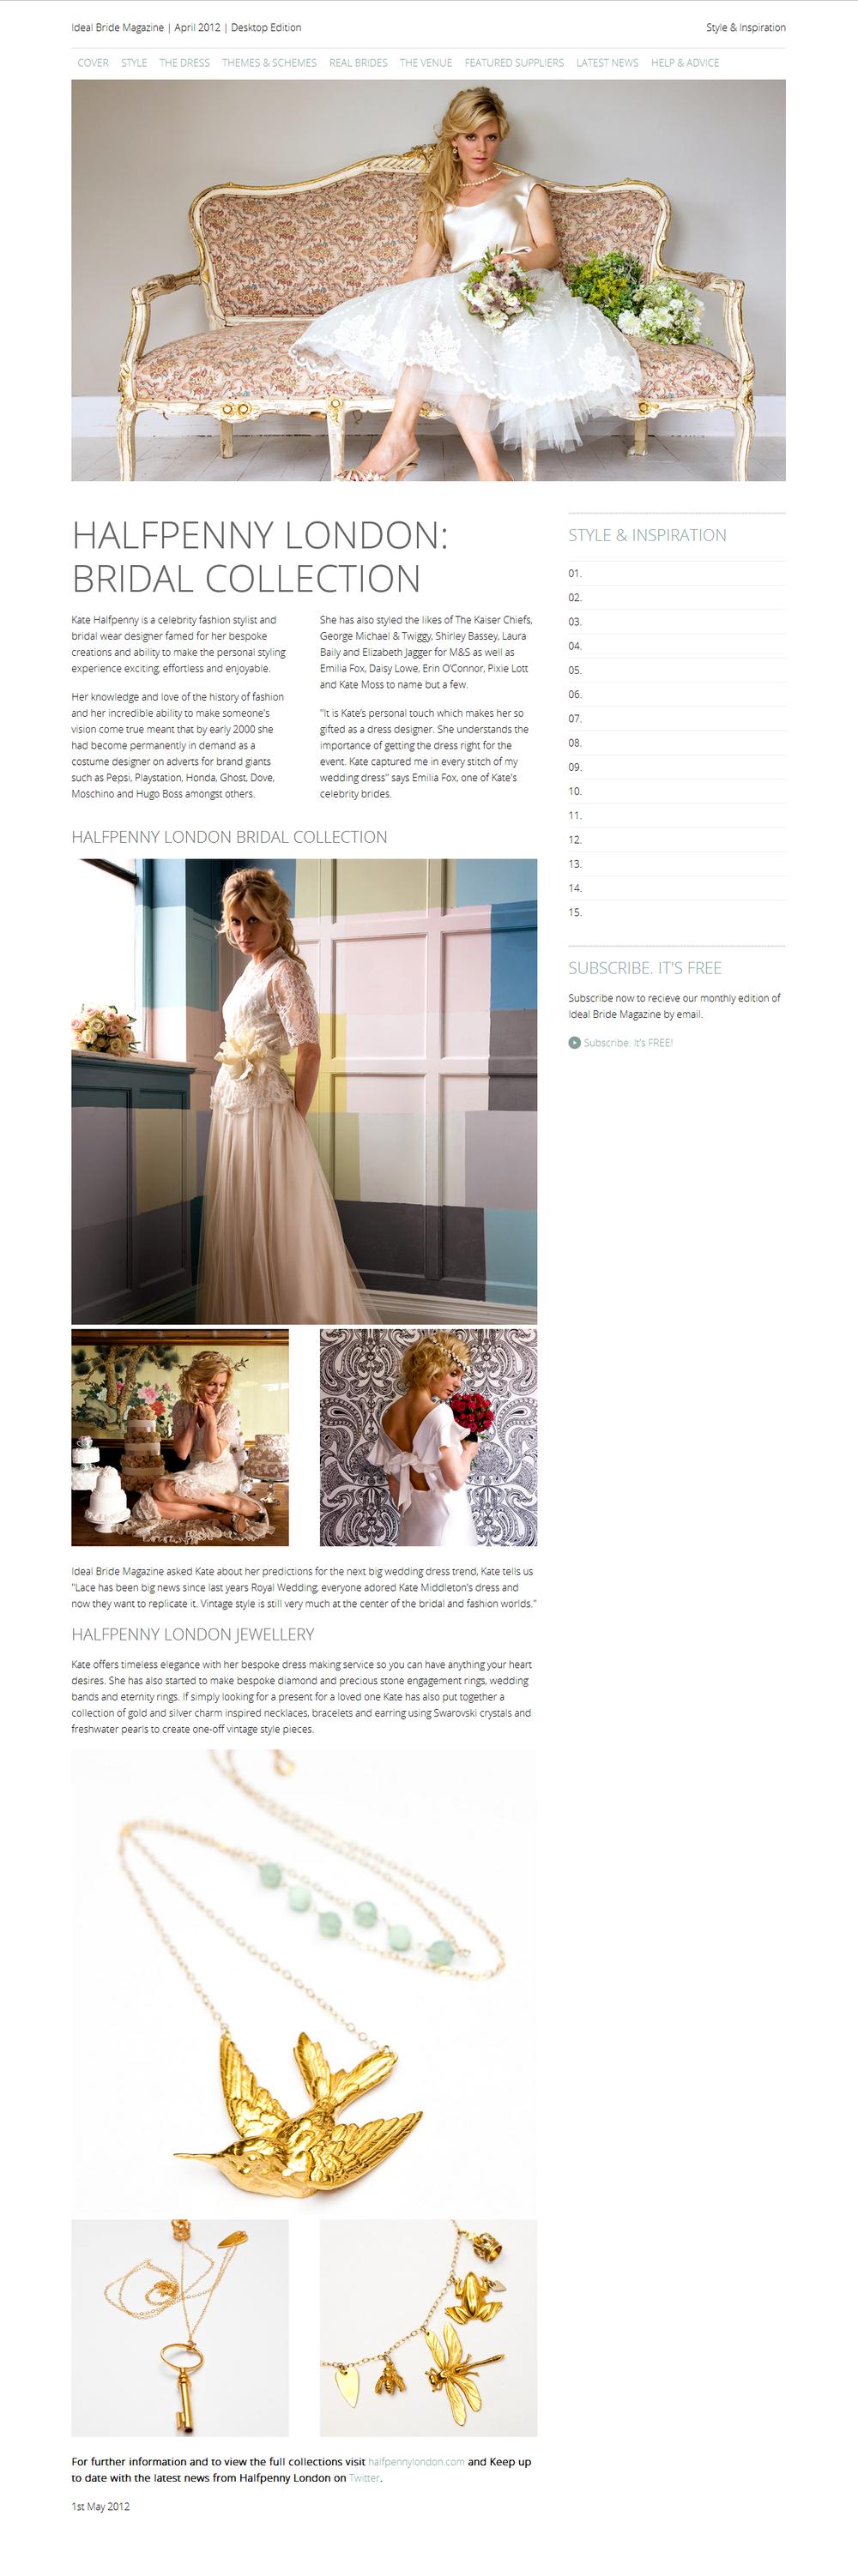 16 2012-05-01-halfpenny-london-bridal-collection copy.jpg